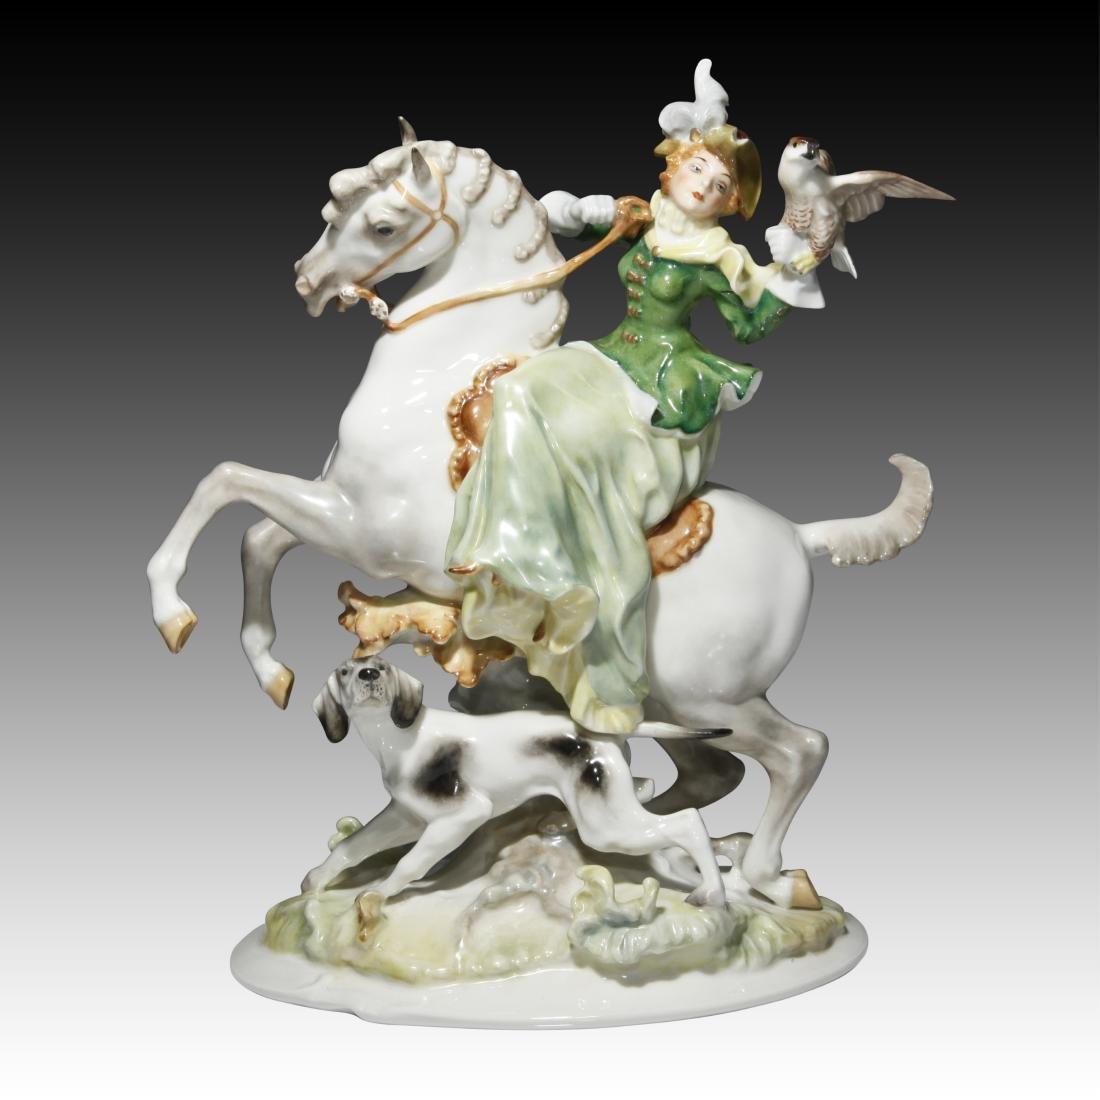 Hutschenreuther Woman on Horseback Figurine